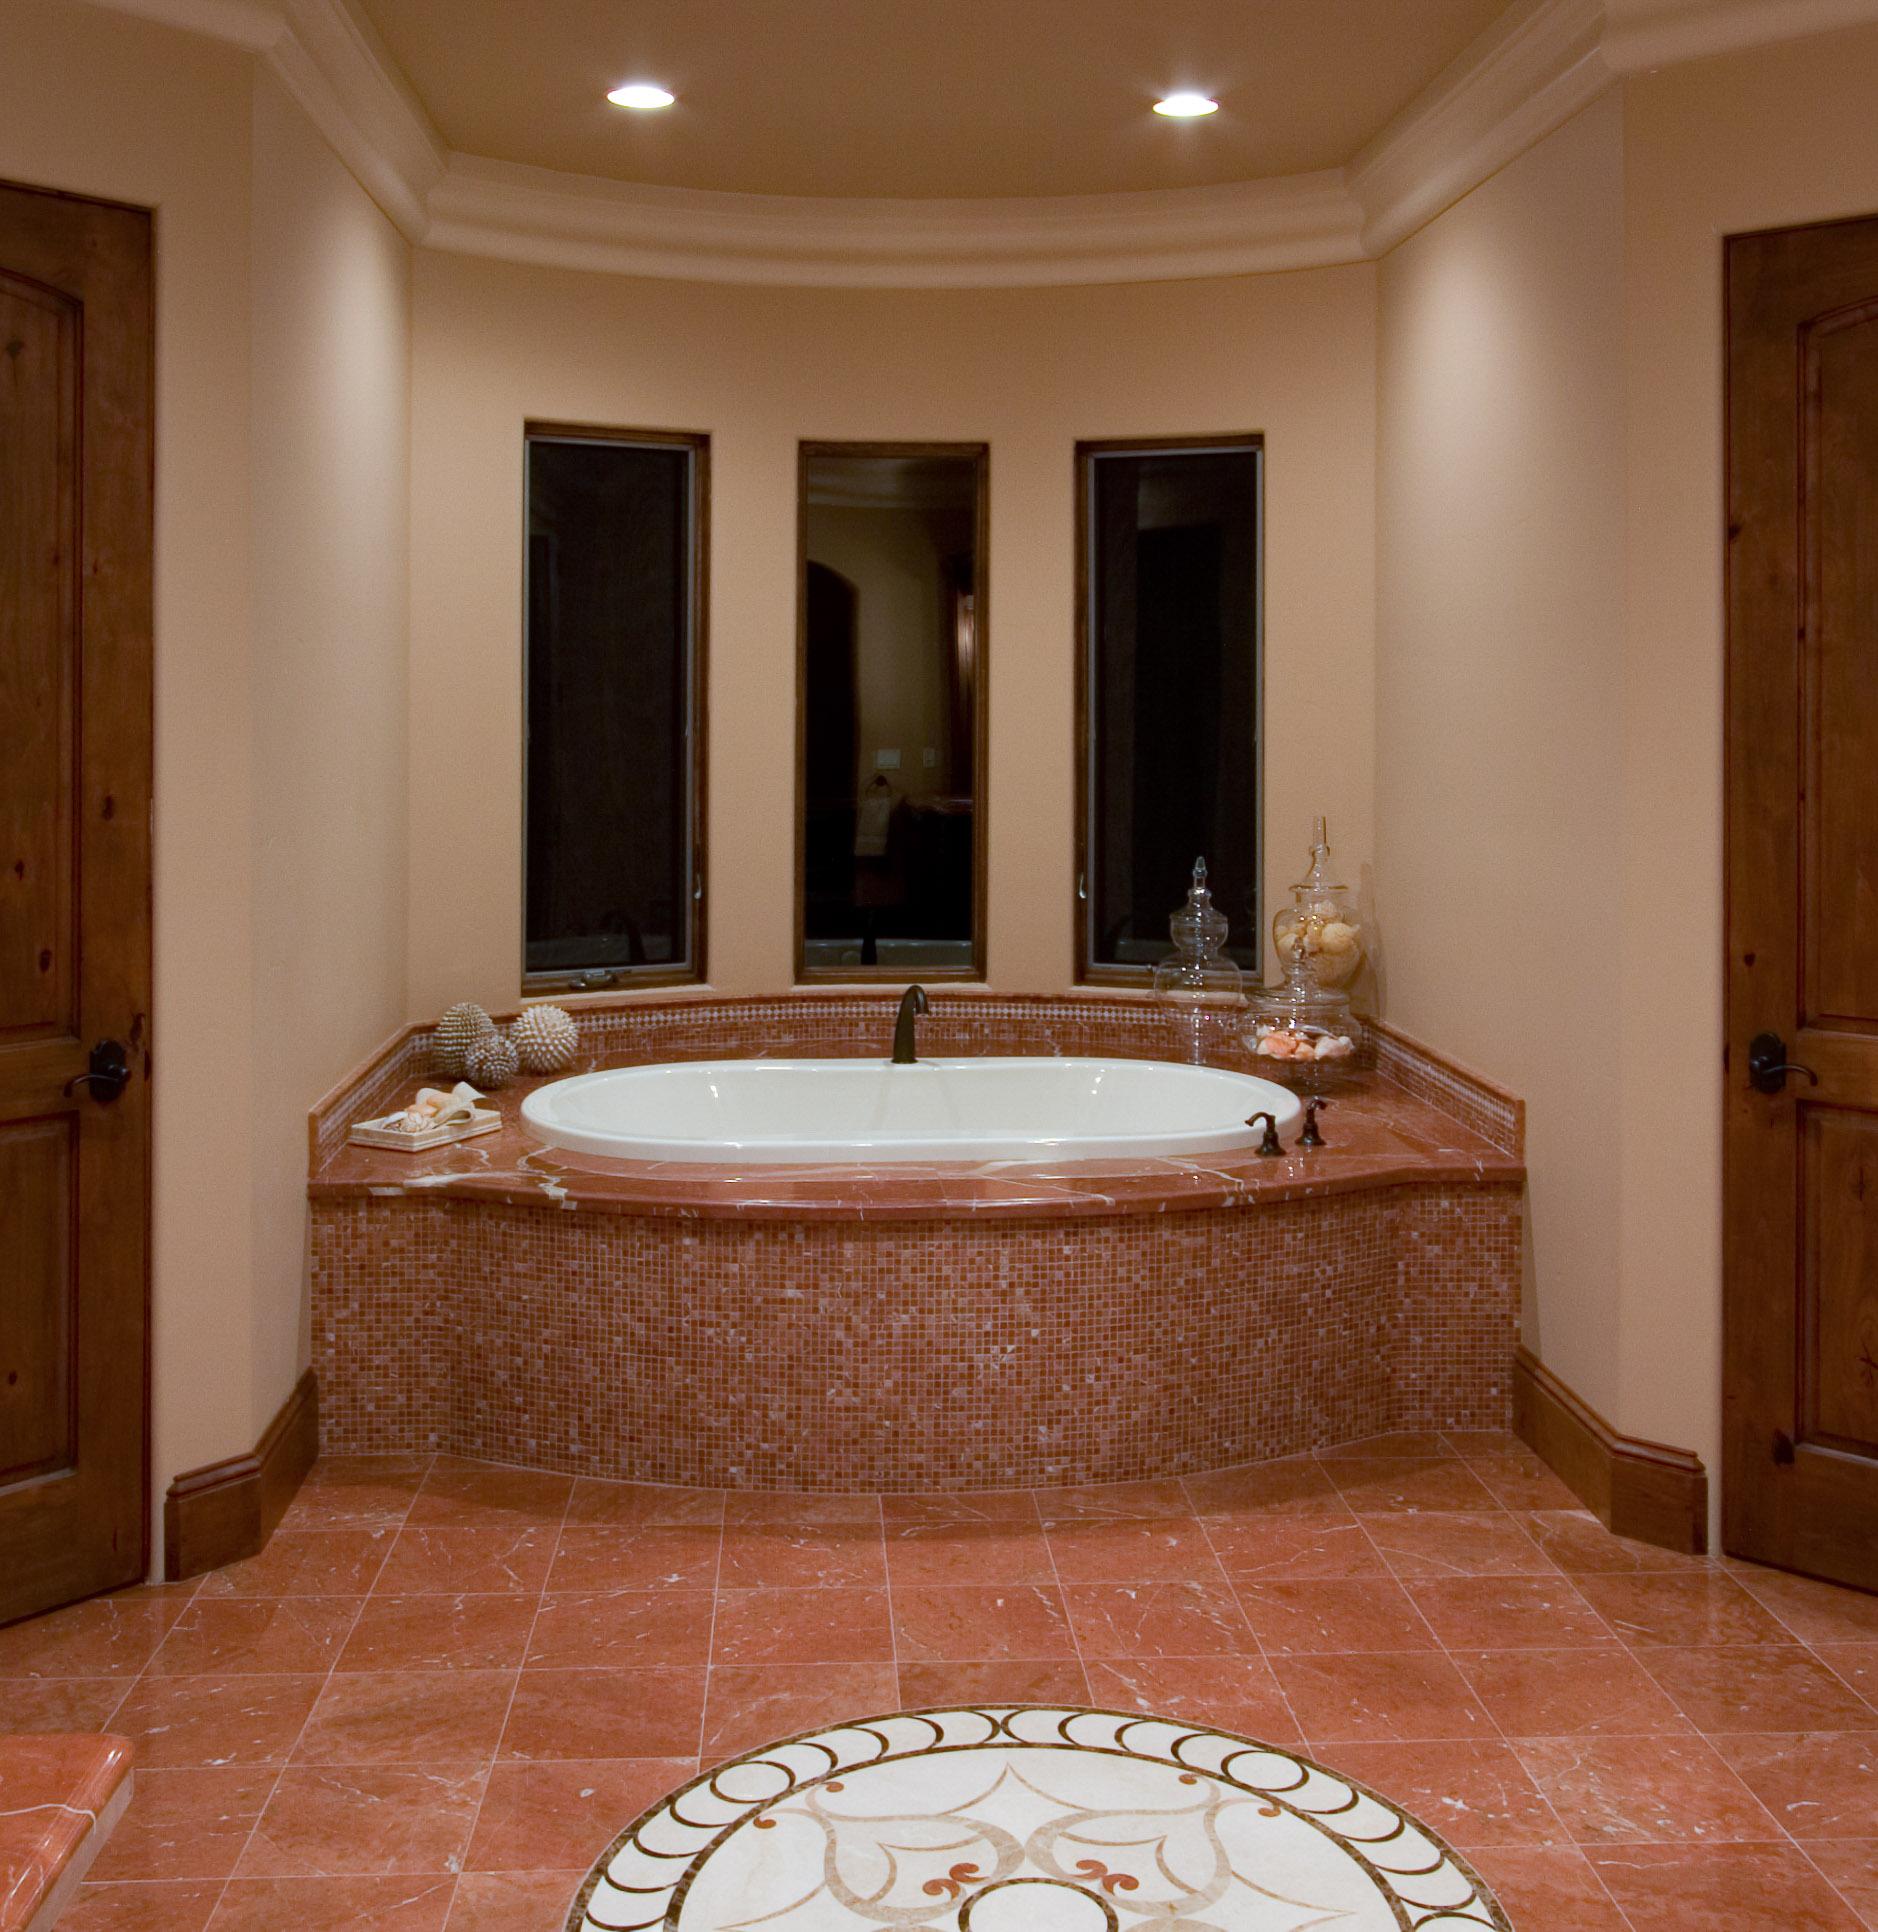 Northern California Santa Barbara Home Builder-9.jpg